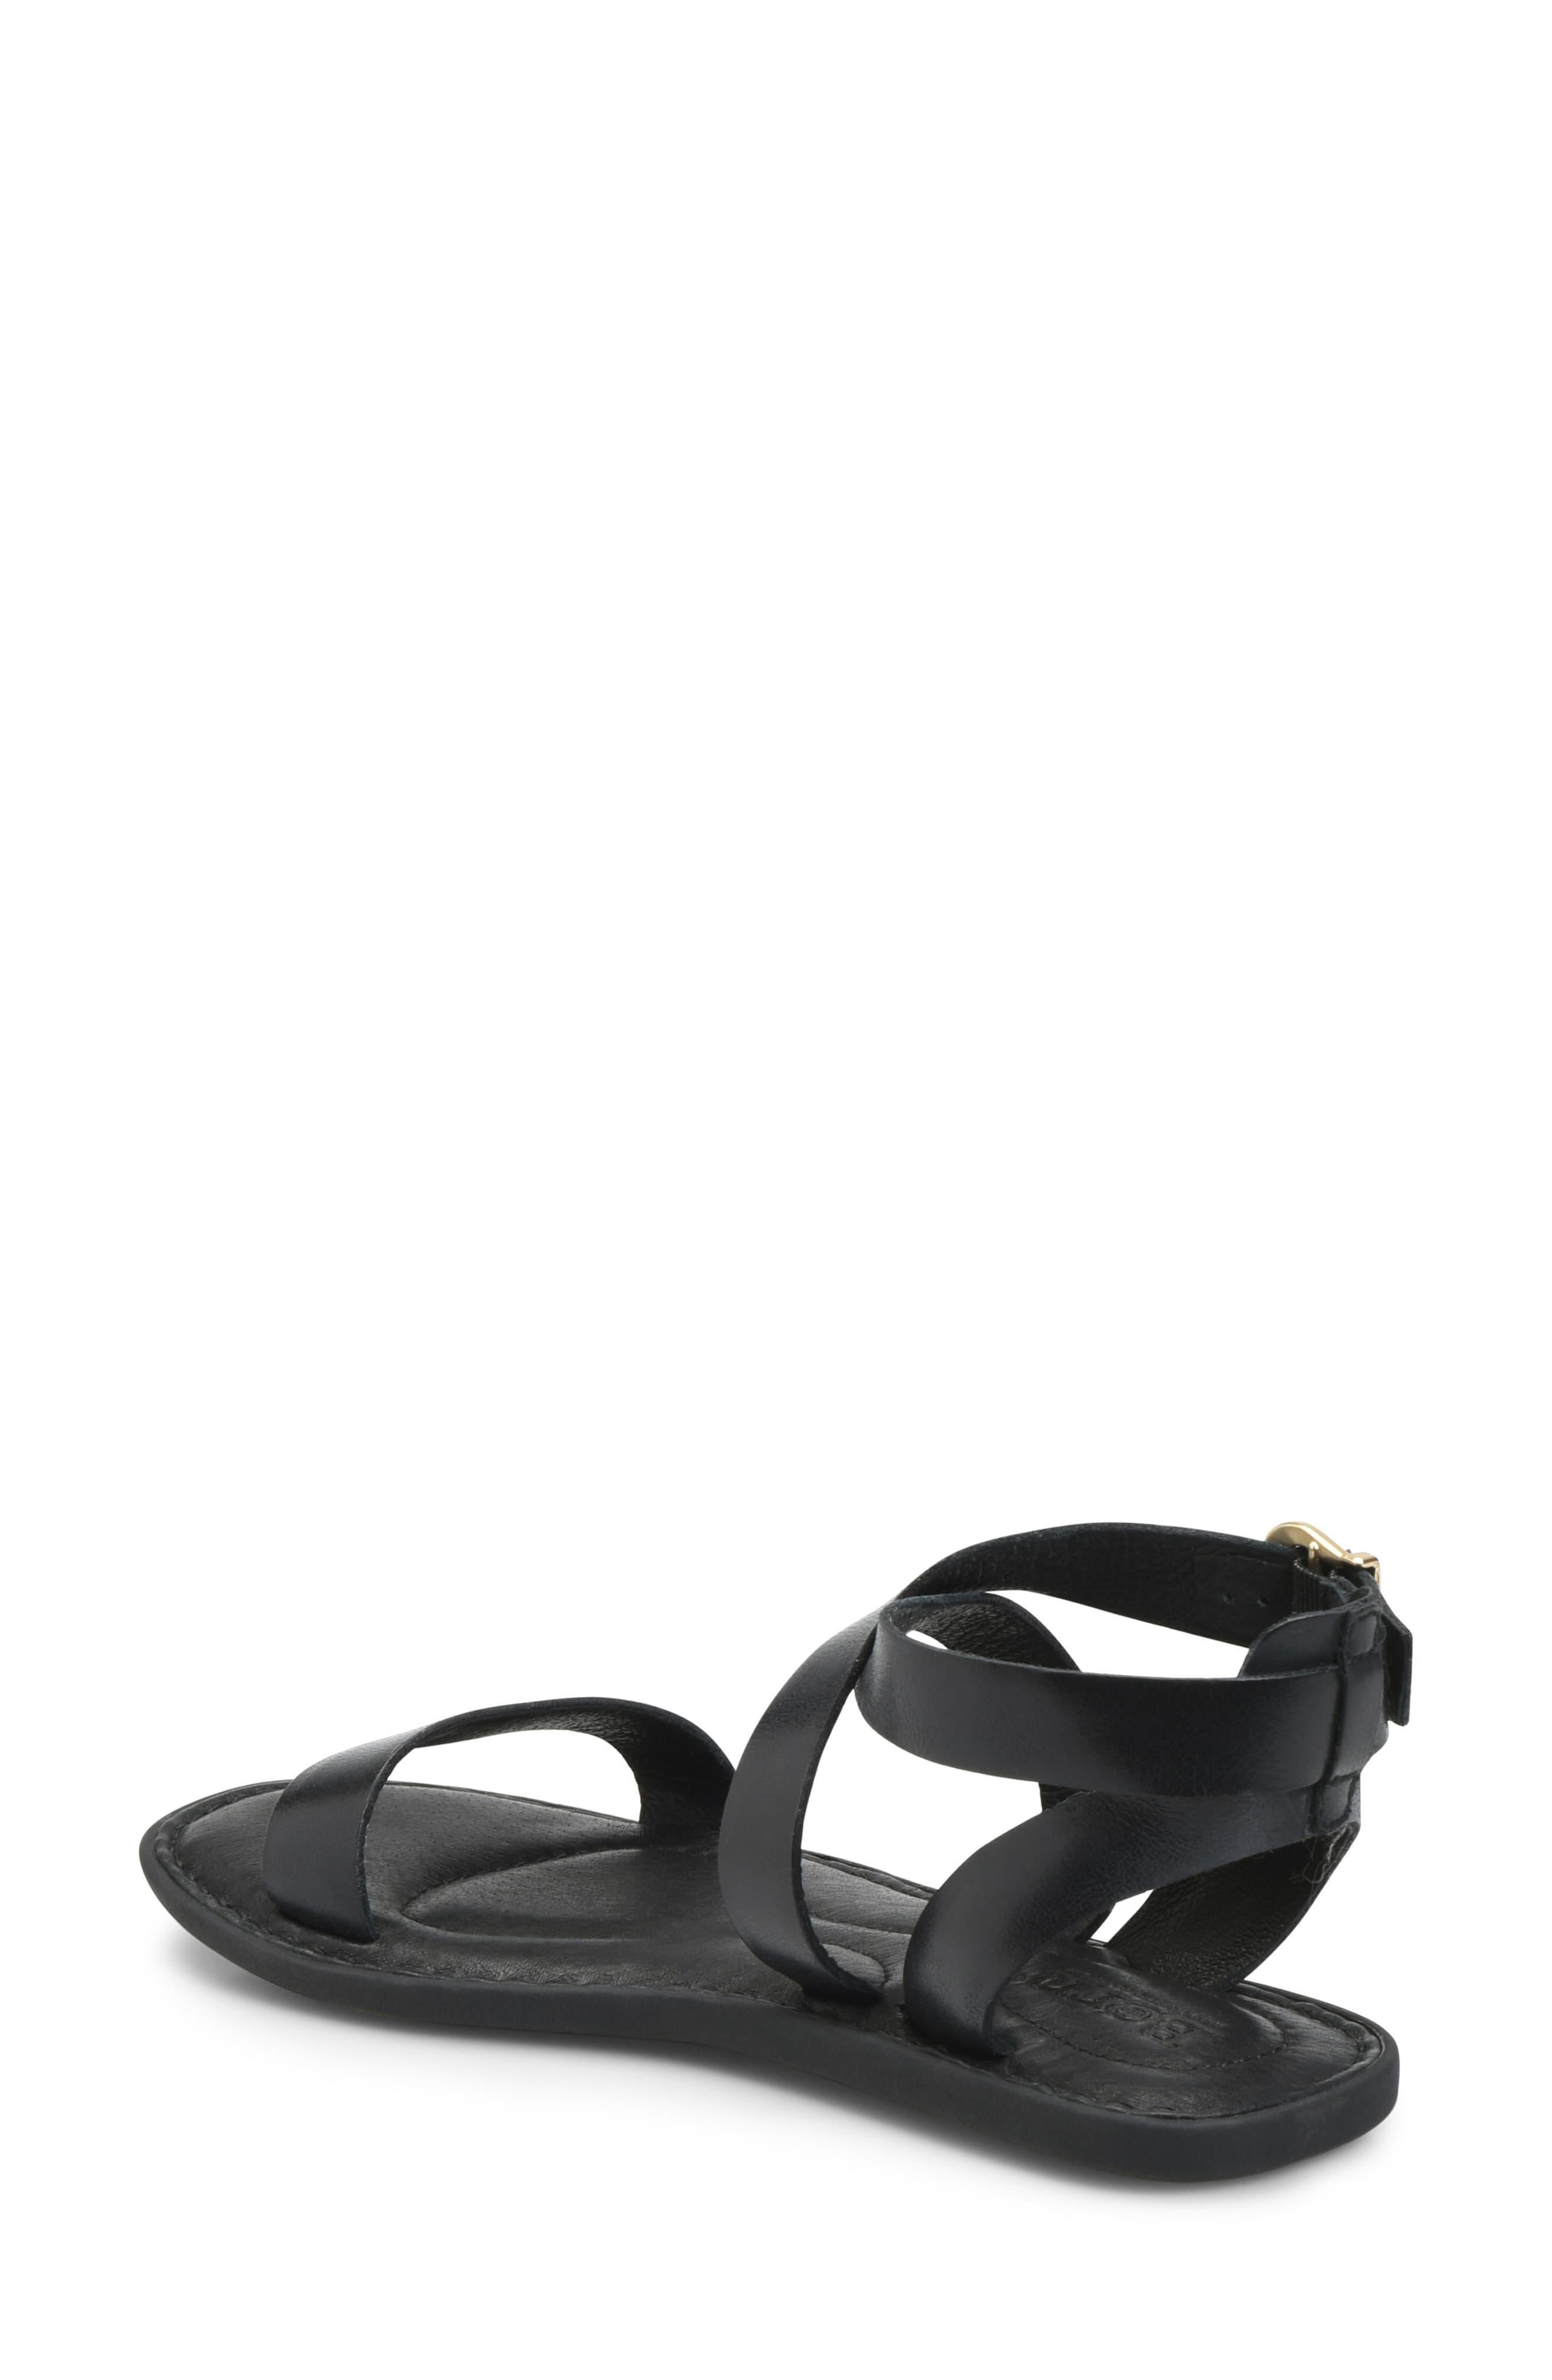 86c3c89d17b Born Børn Oak Ankle Strap Sandal in Black - Lyst